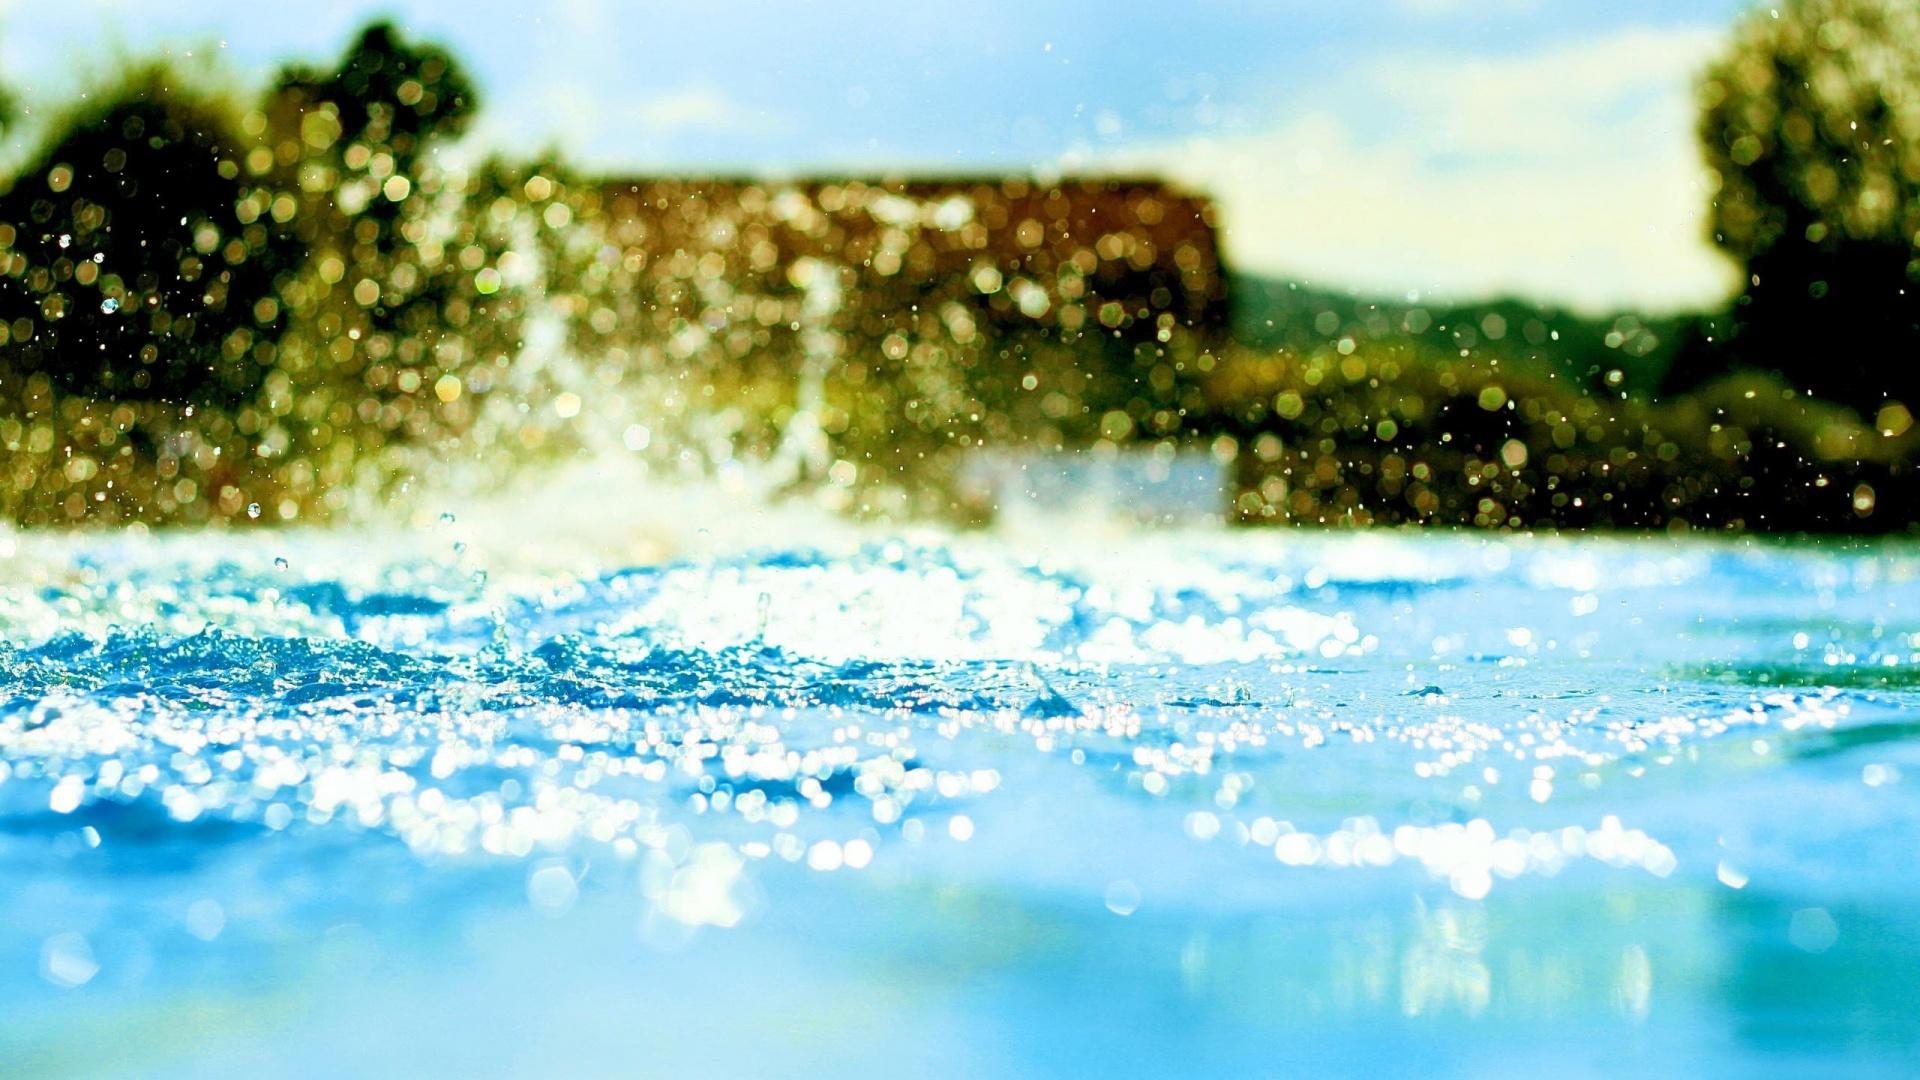 20 lovely hd water wallpapers - Water wallpaper hd download ...